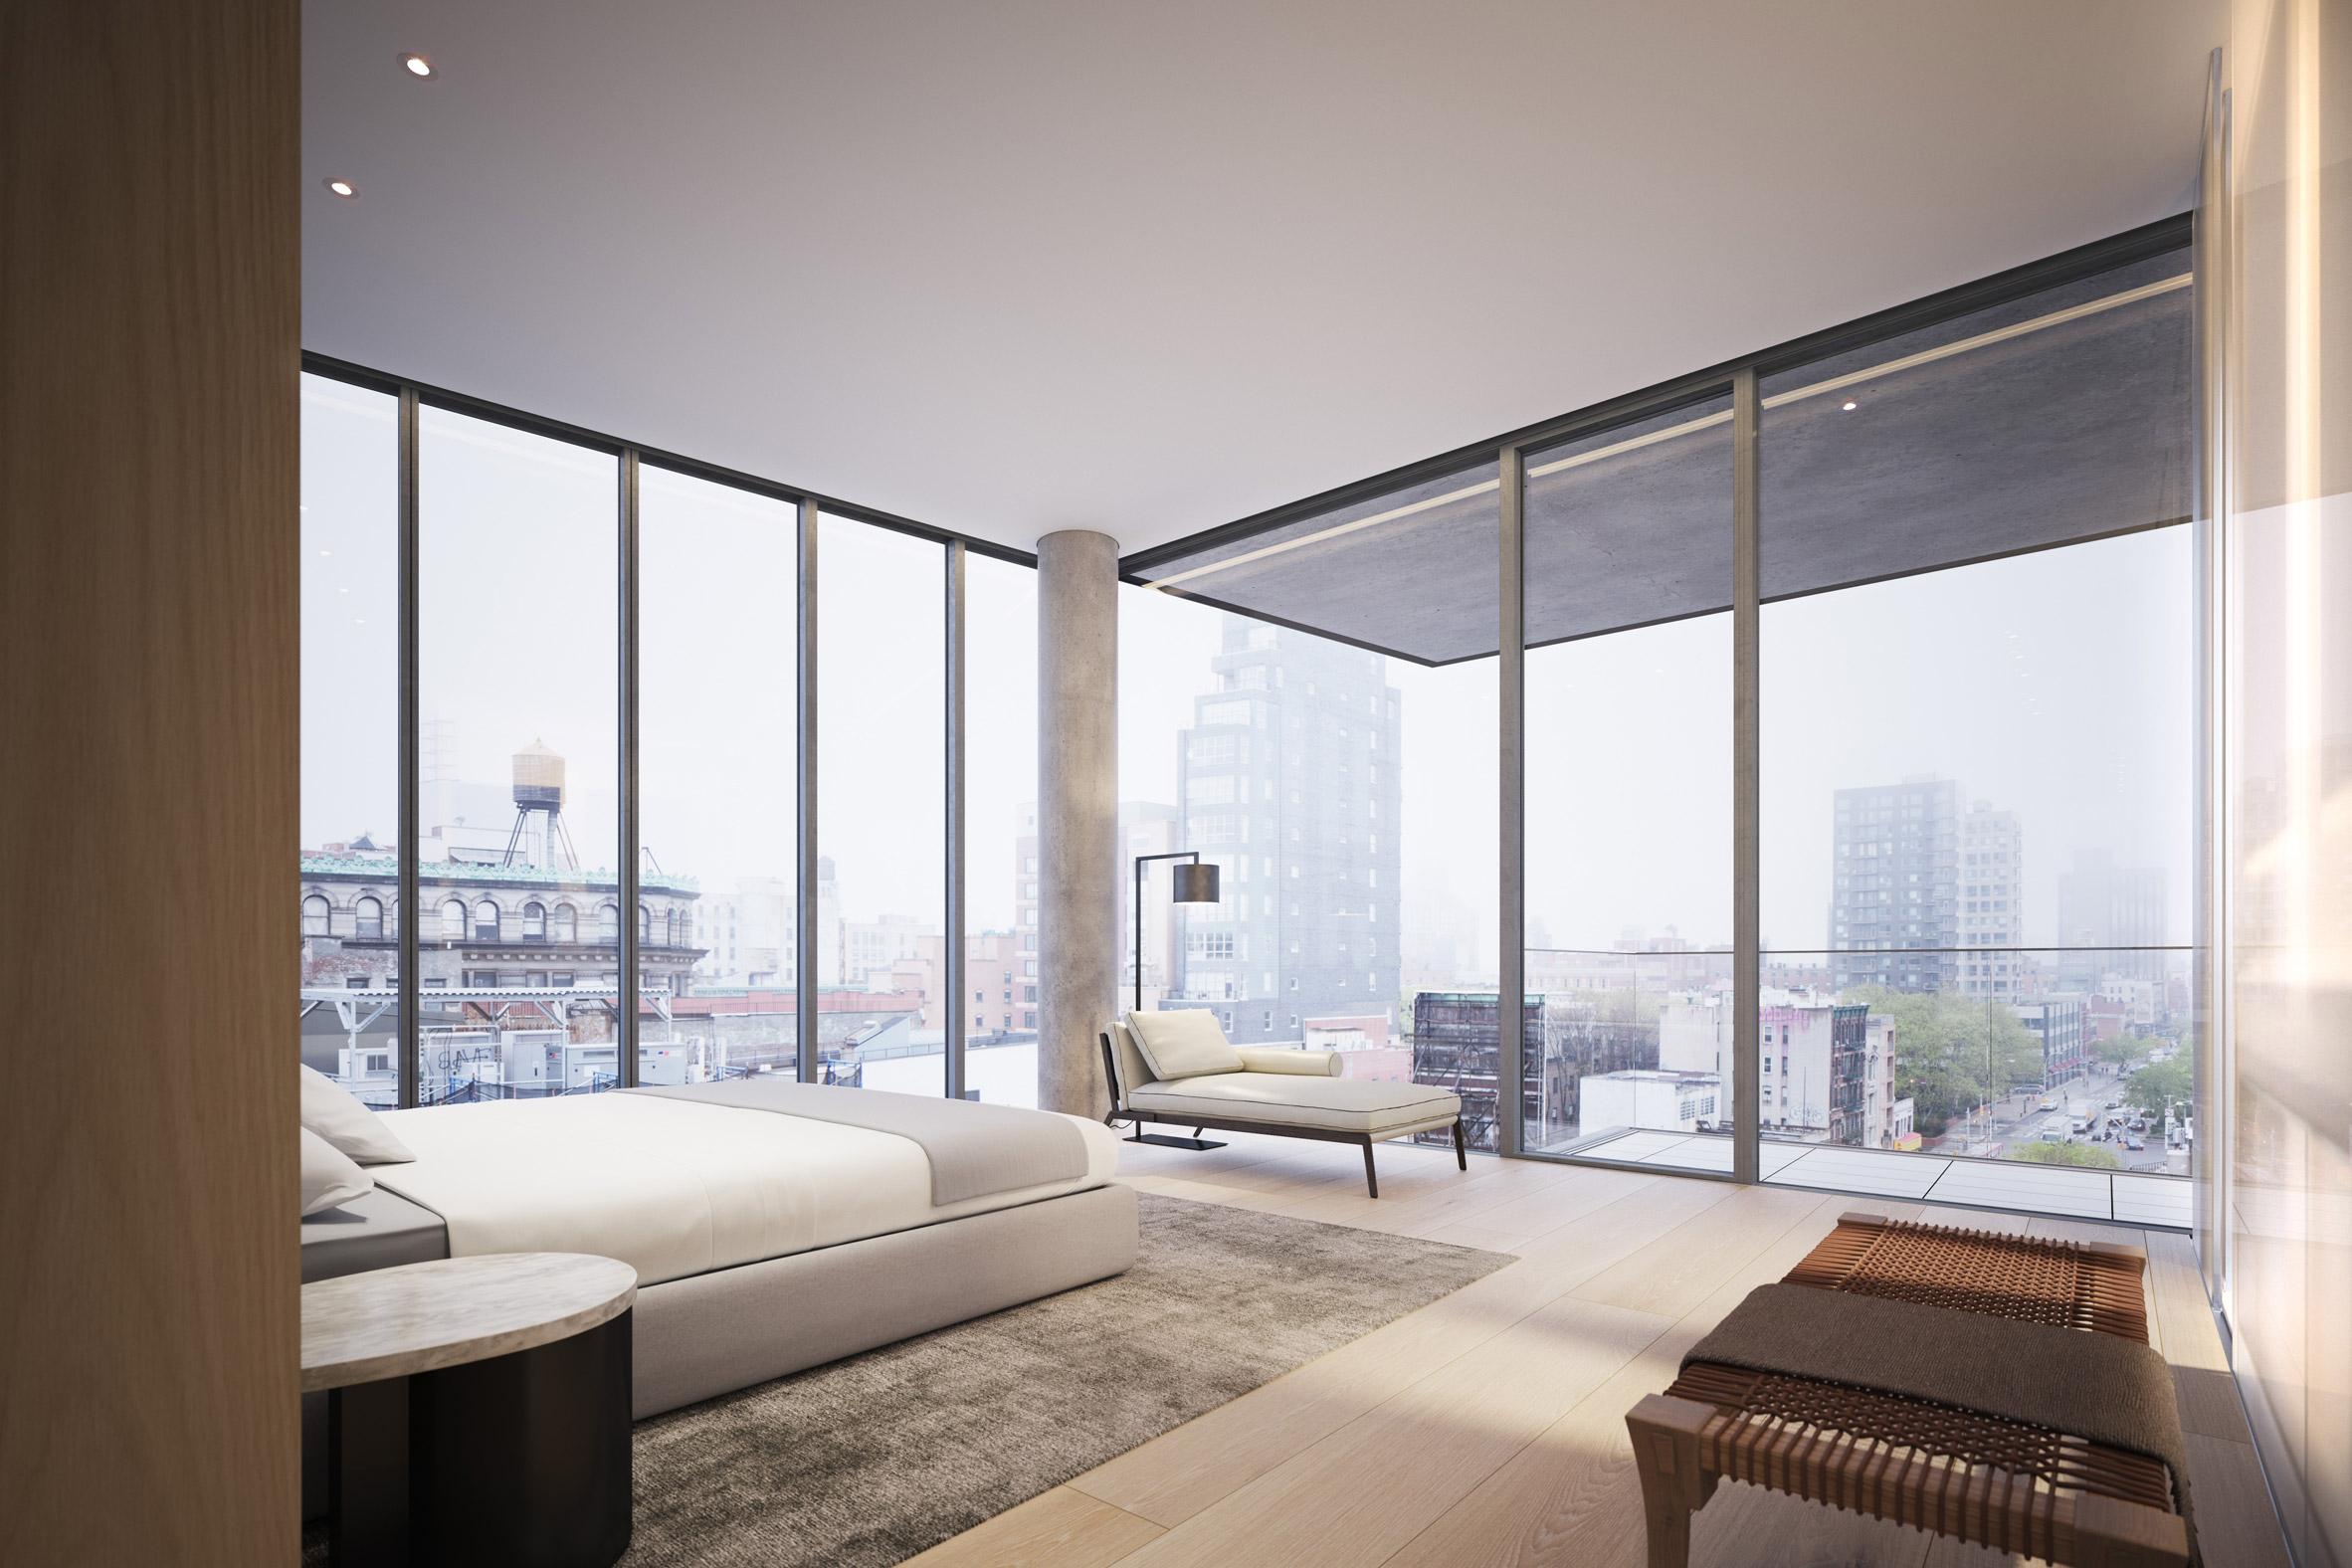 Thiết kế nội thất căn hộ Duplex 4